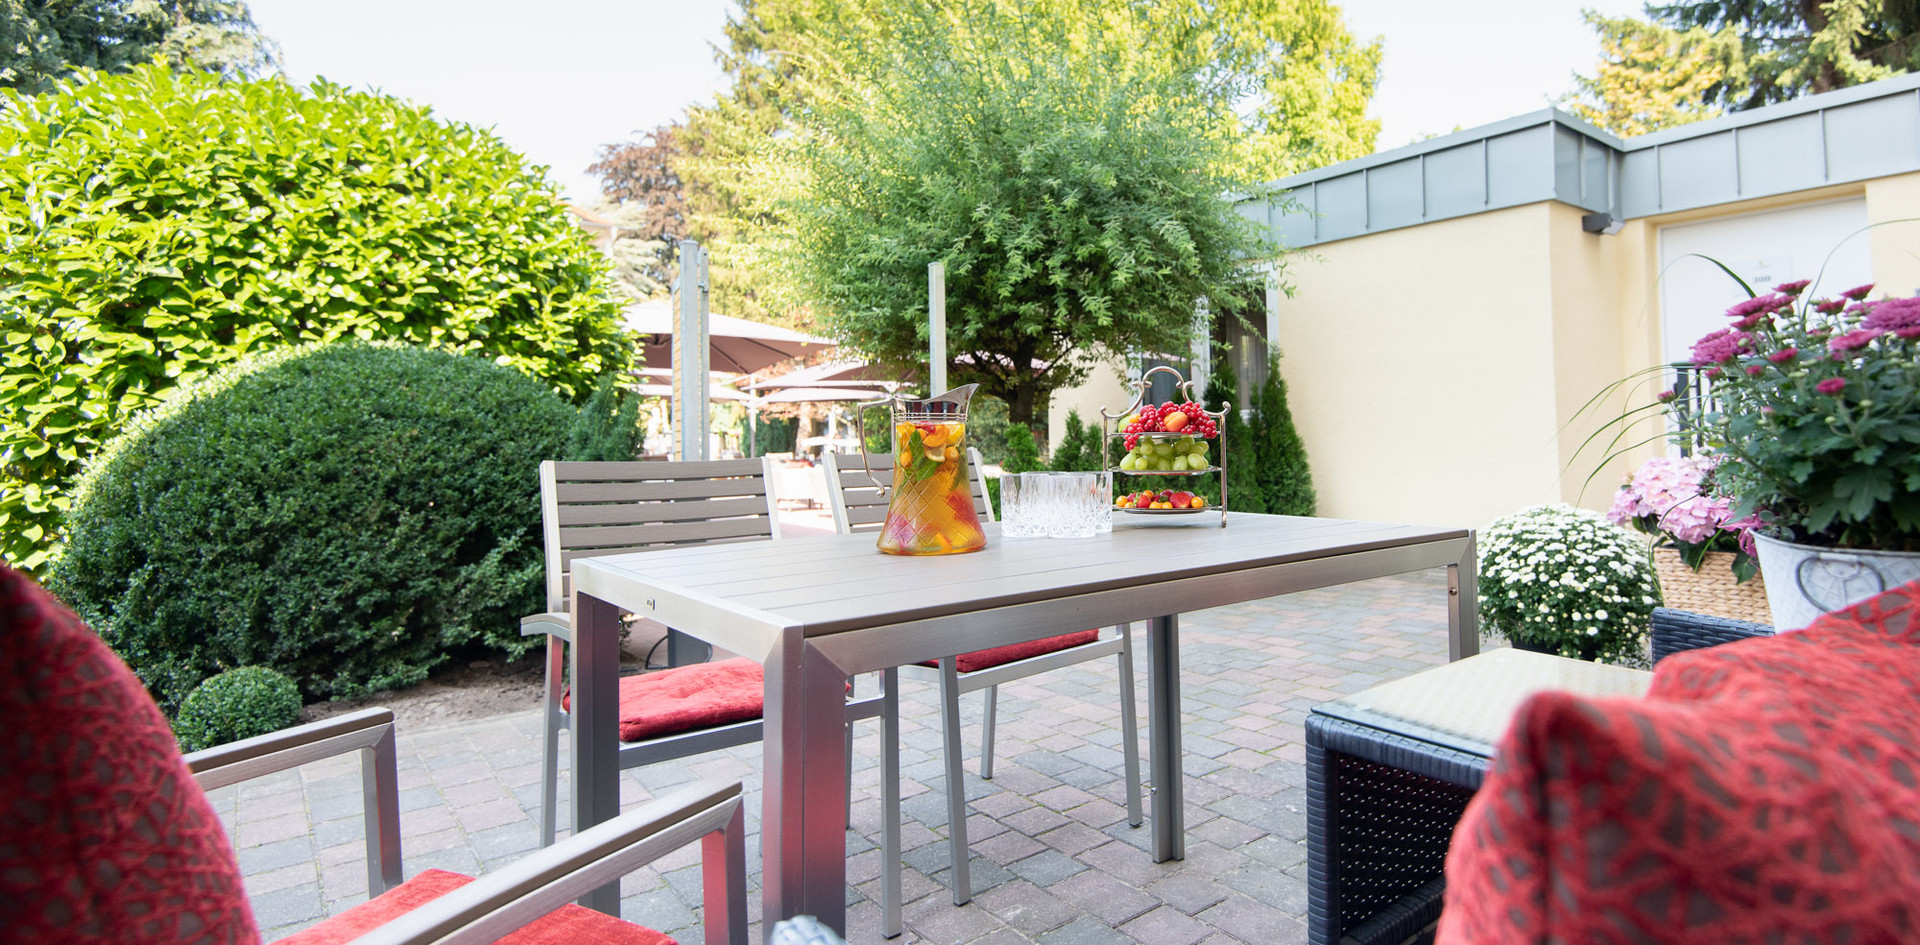 bequeme Sitze Hotel Wegner - the culinary art hotel